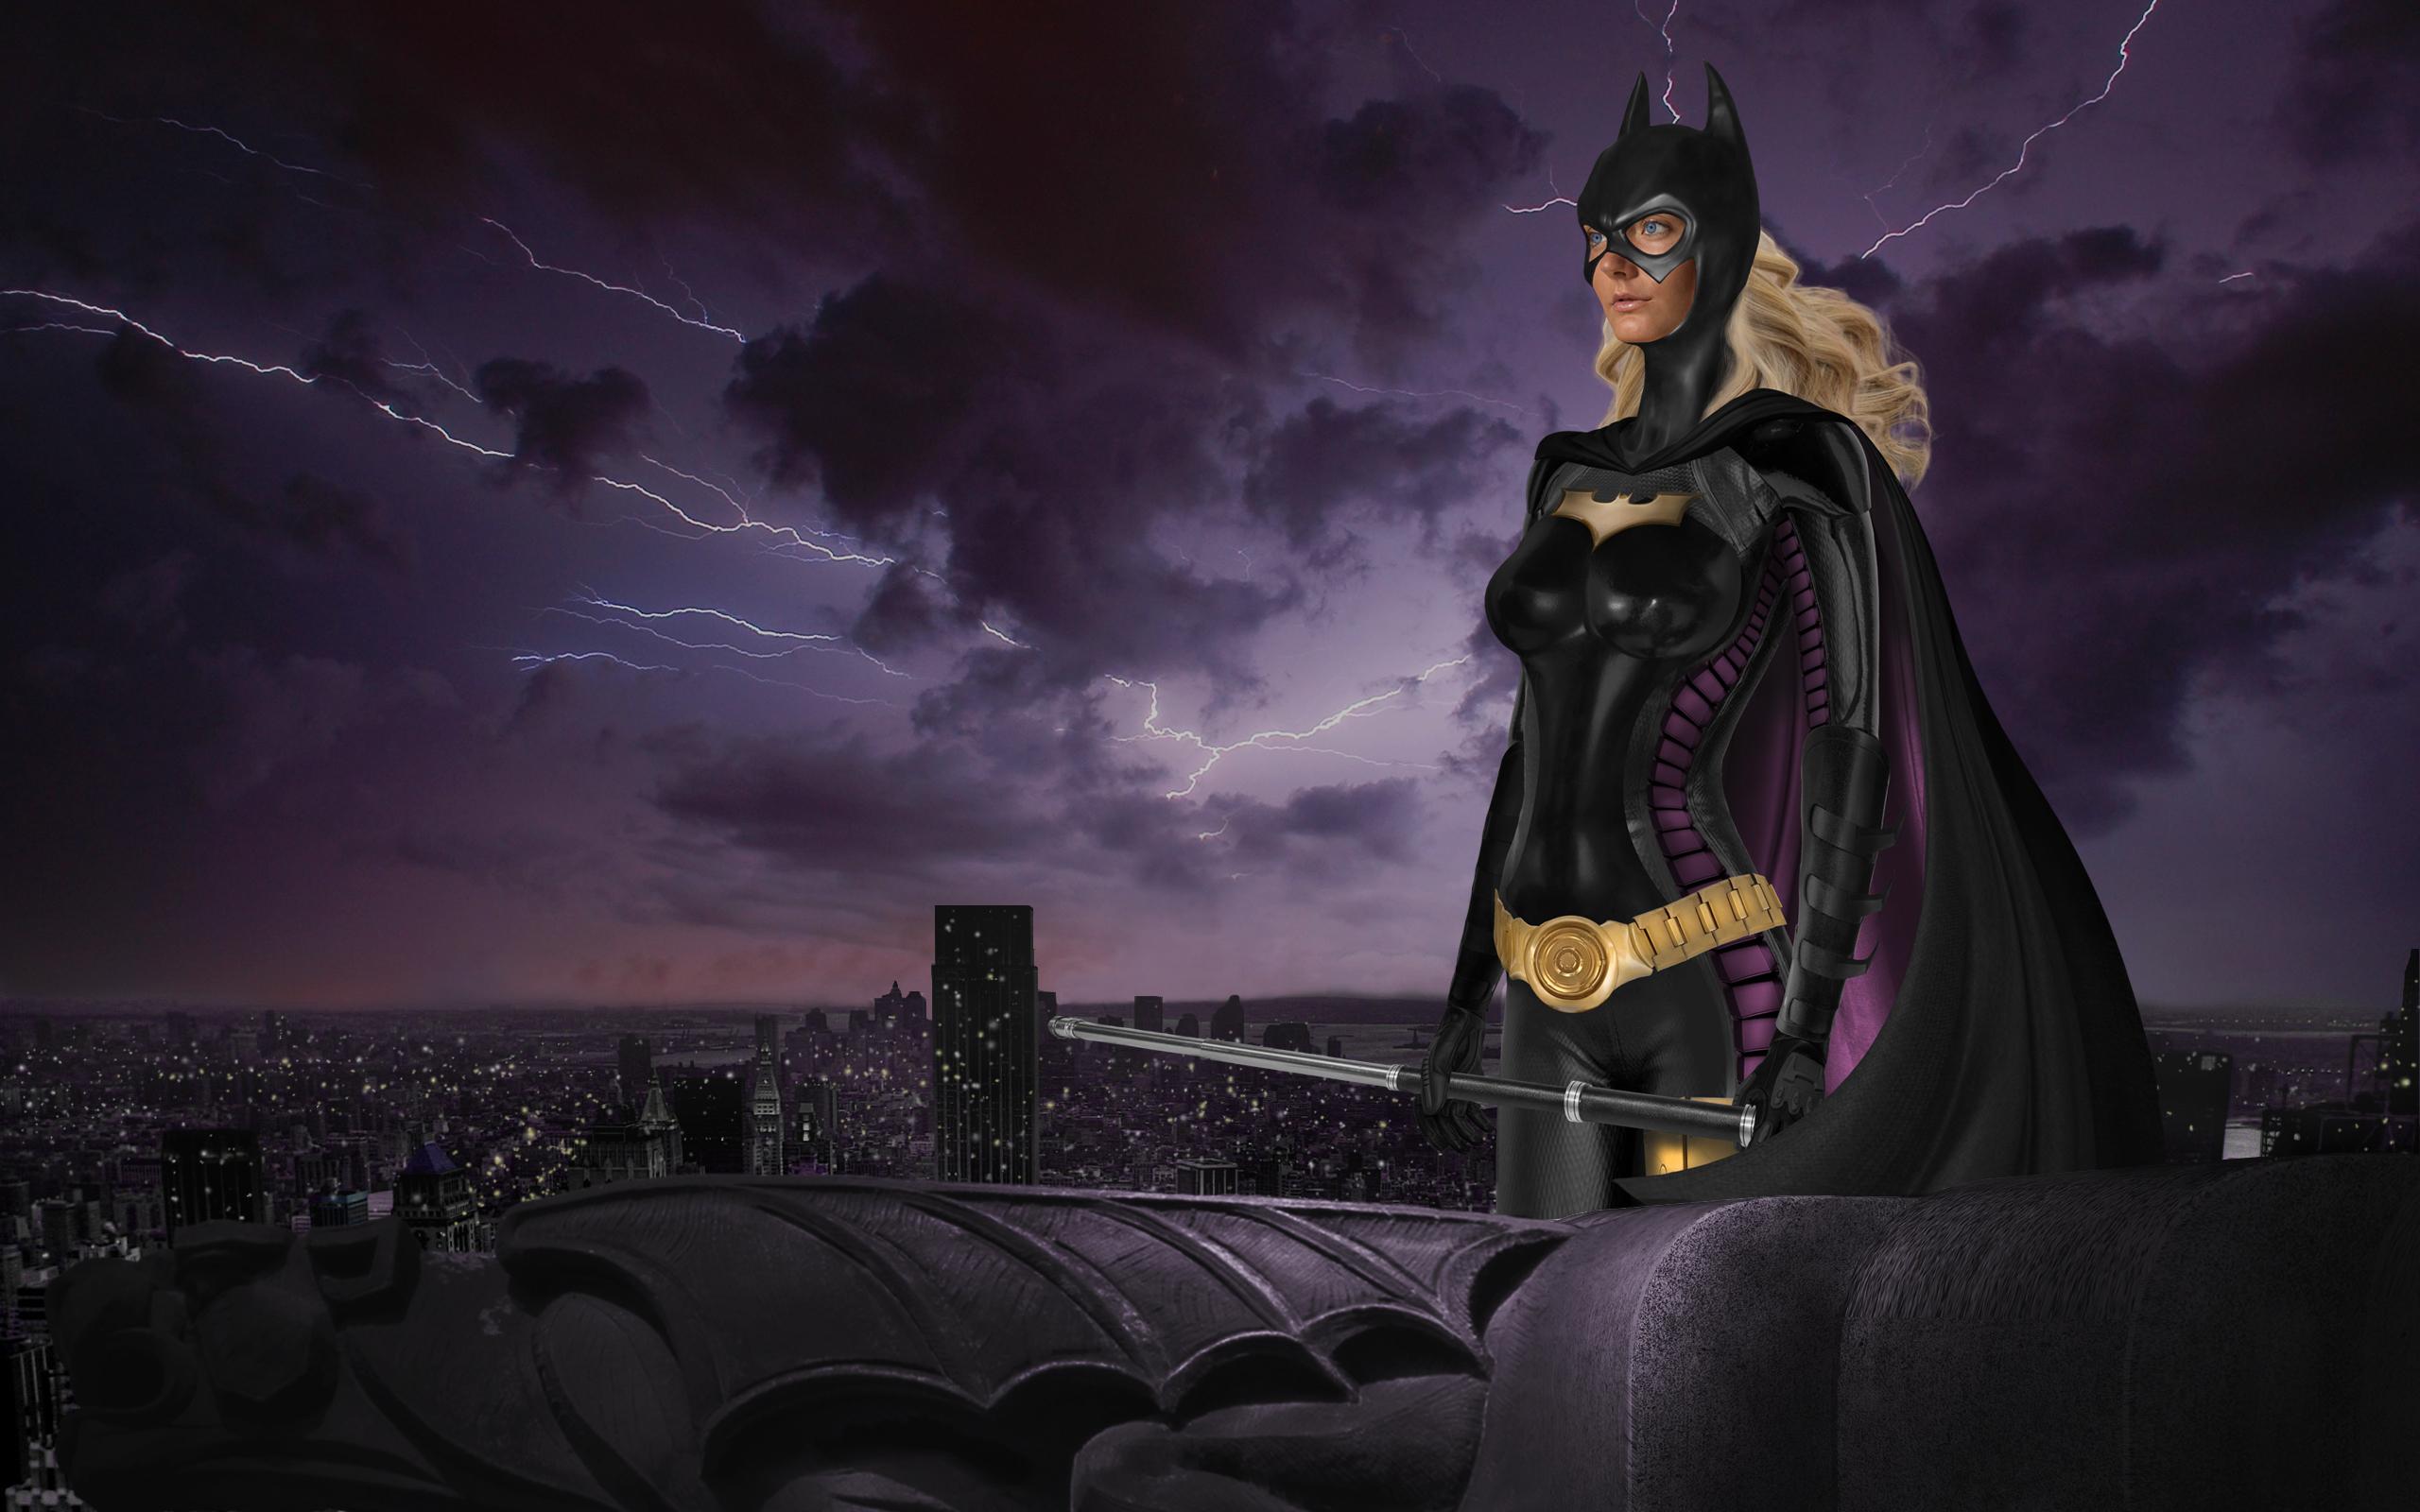 batgirl new 52 wallpaper - photo #31